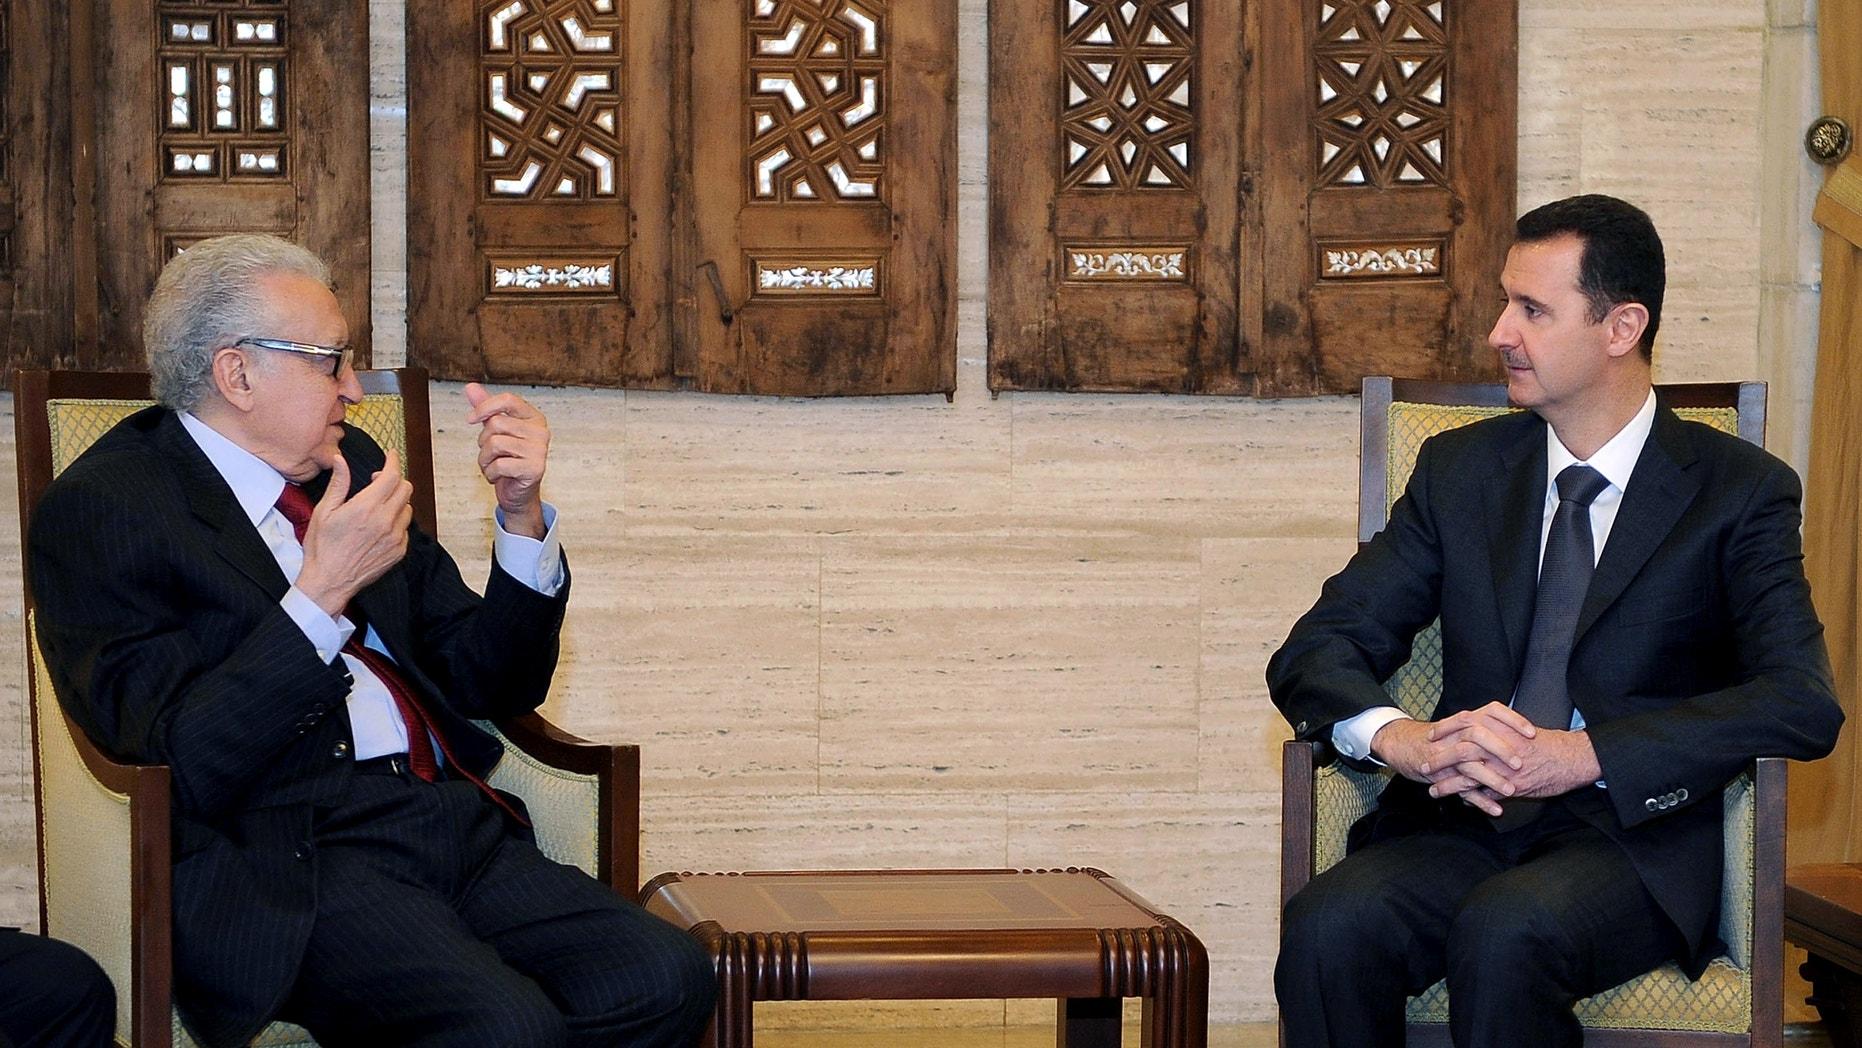 Dec. 24, 2012 - Syrian President Bashar al-Assad, right, meets with UN Arab League deputy to Syria, Lakhdar Brahimi in Damascus, Syria.